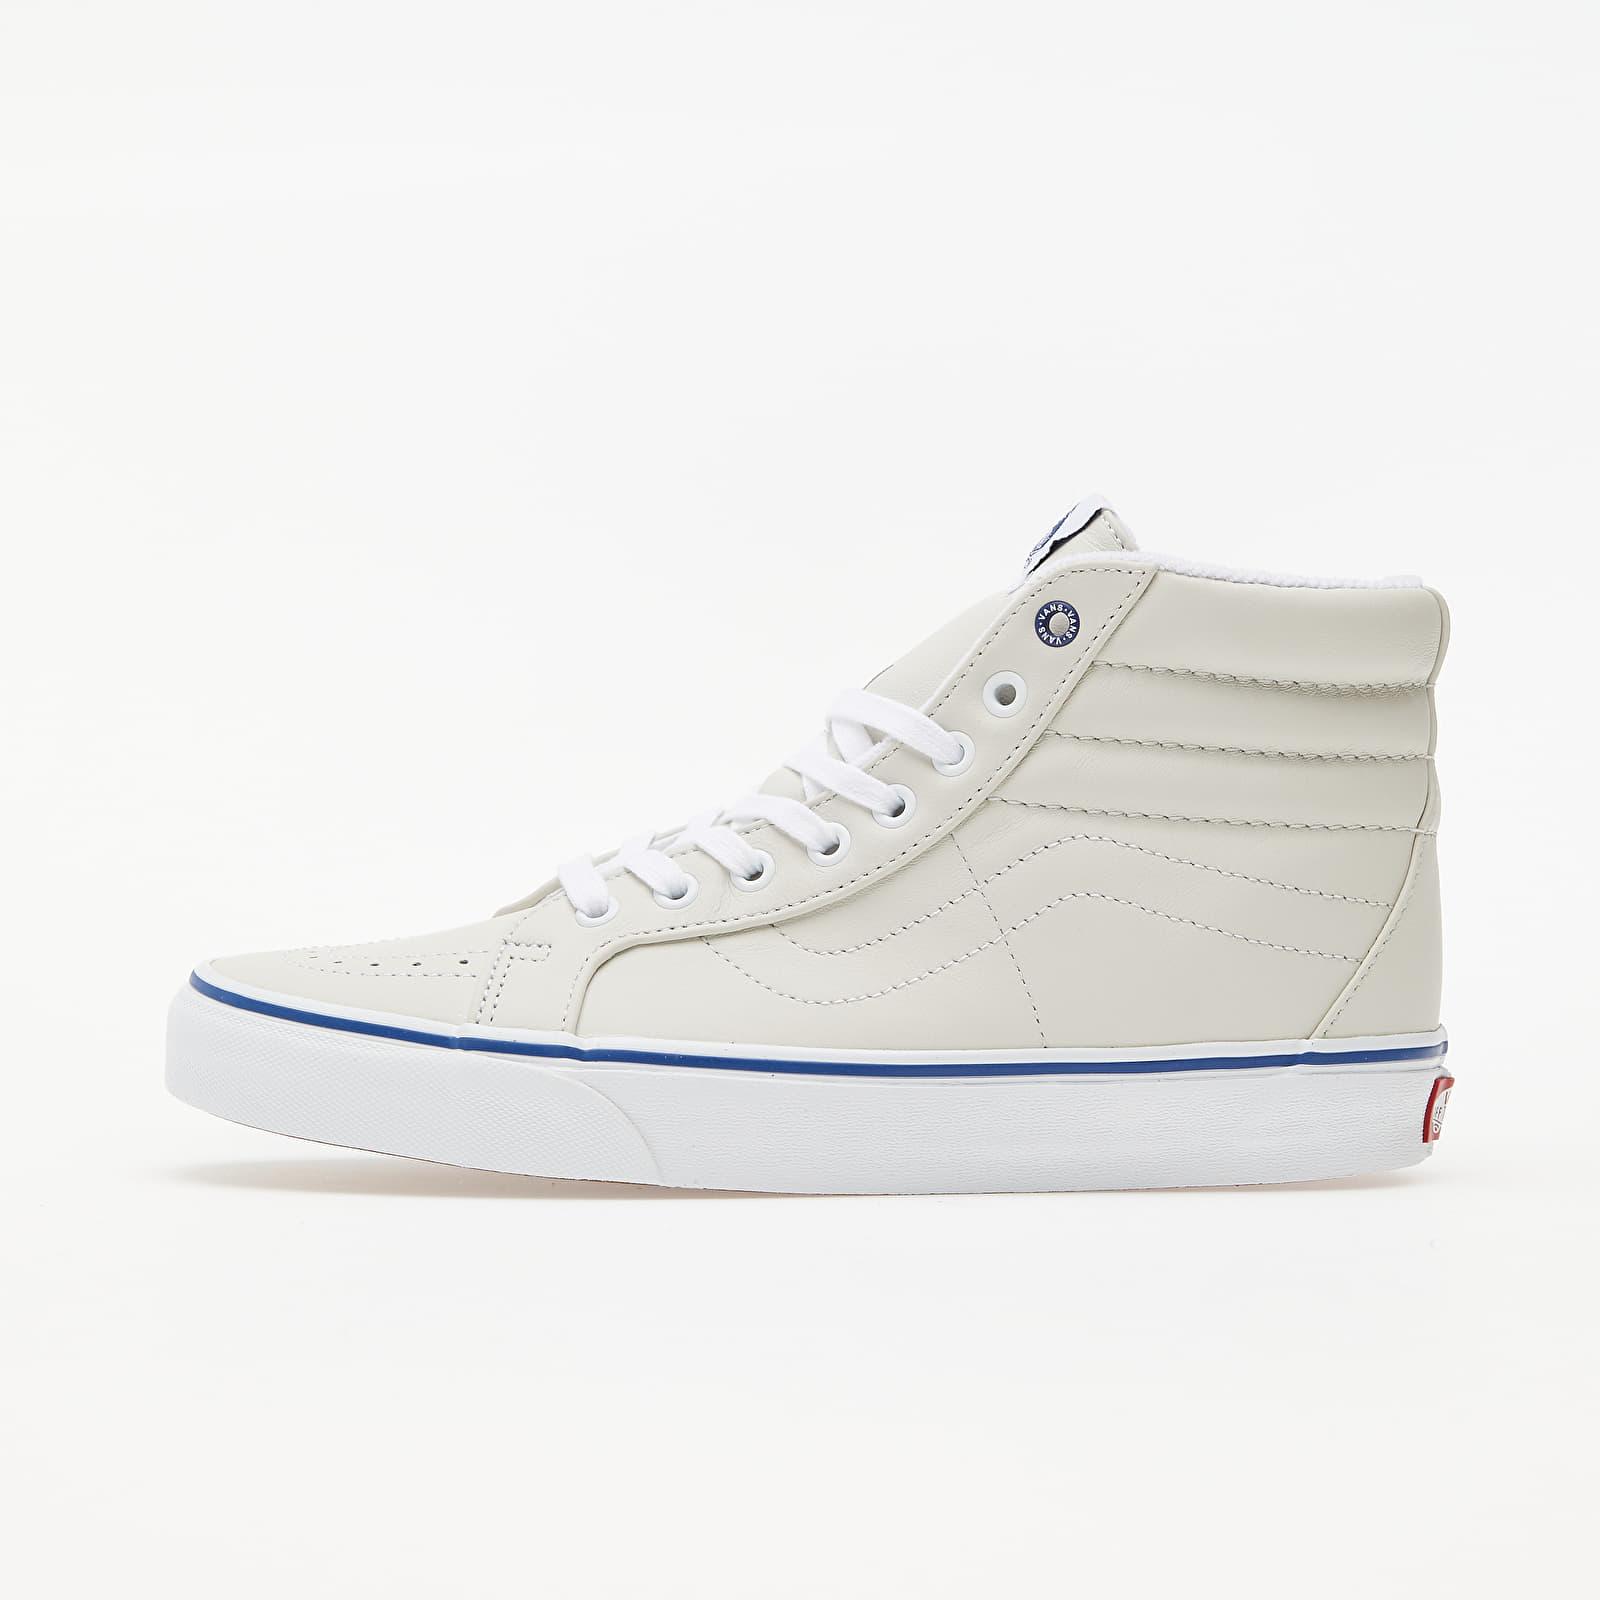 Vans Sk8-Hi Reissue (Butter Leather) True White/ Limoges EUR 40.5